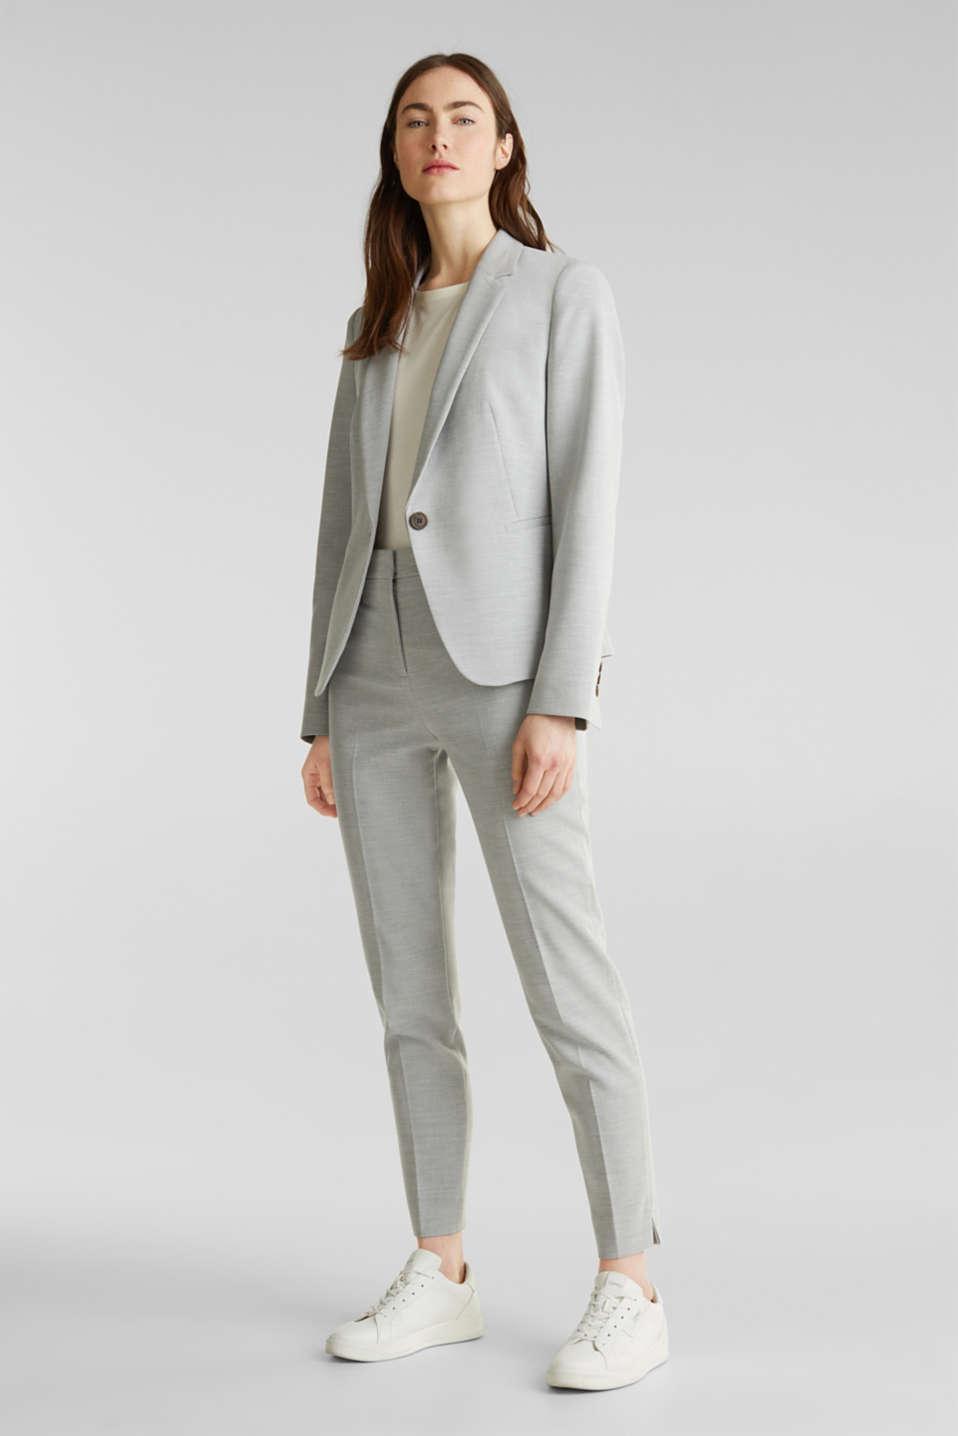 SUMMER BIZ mix + match stretch blazer, LIGHT GREY 5, detail image number 1